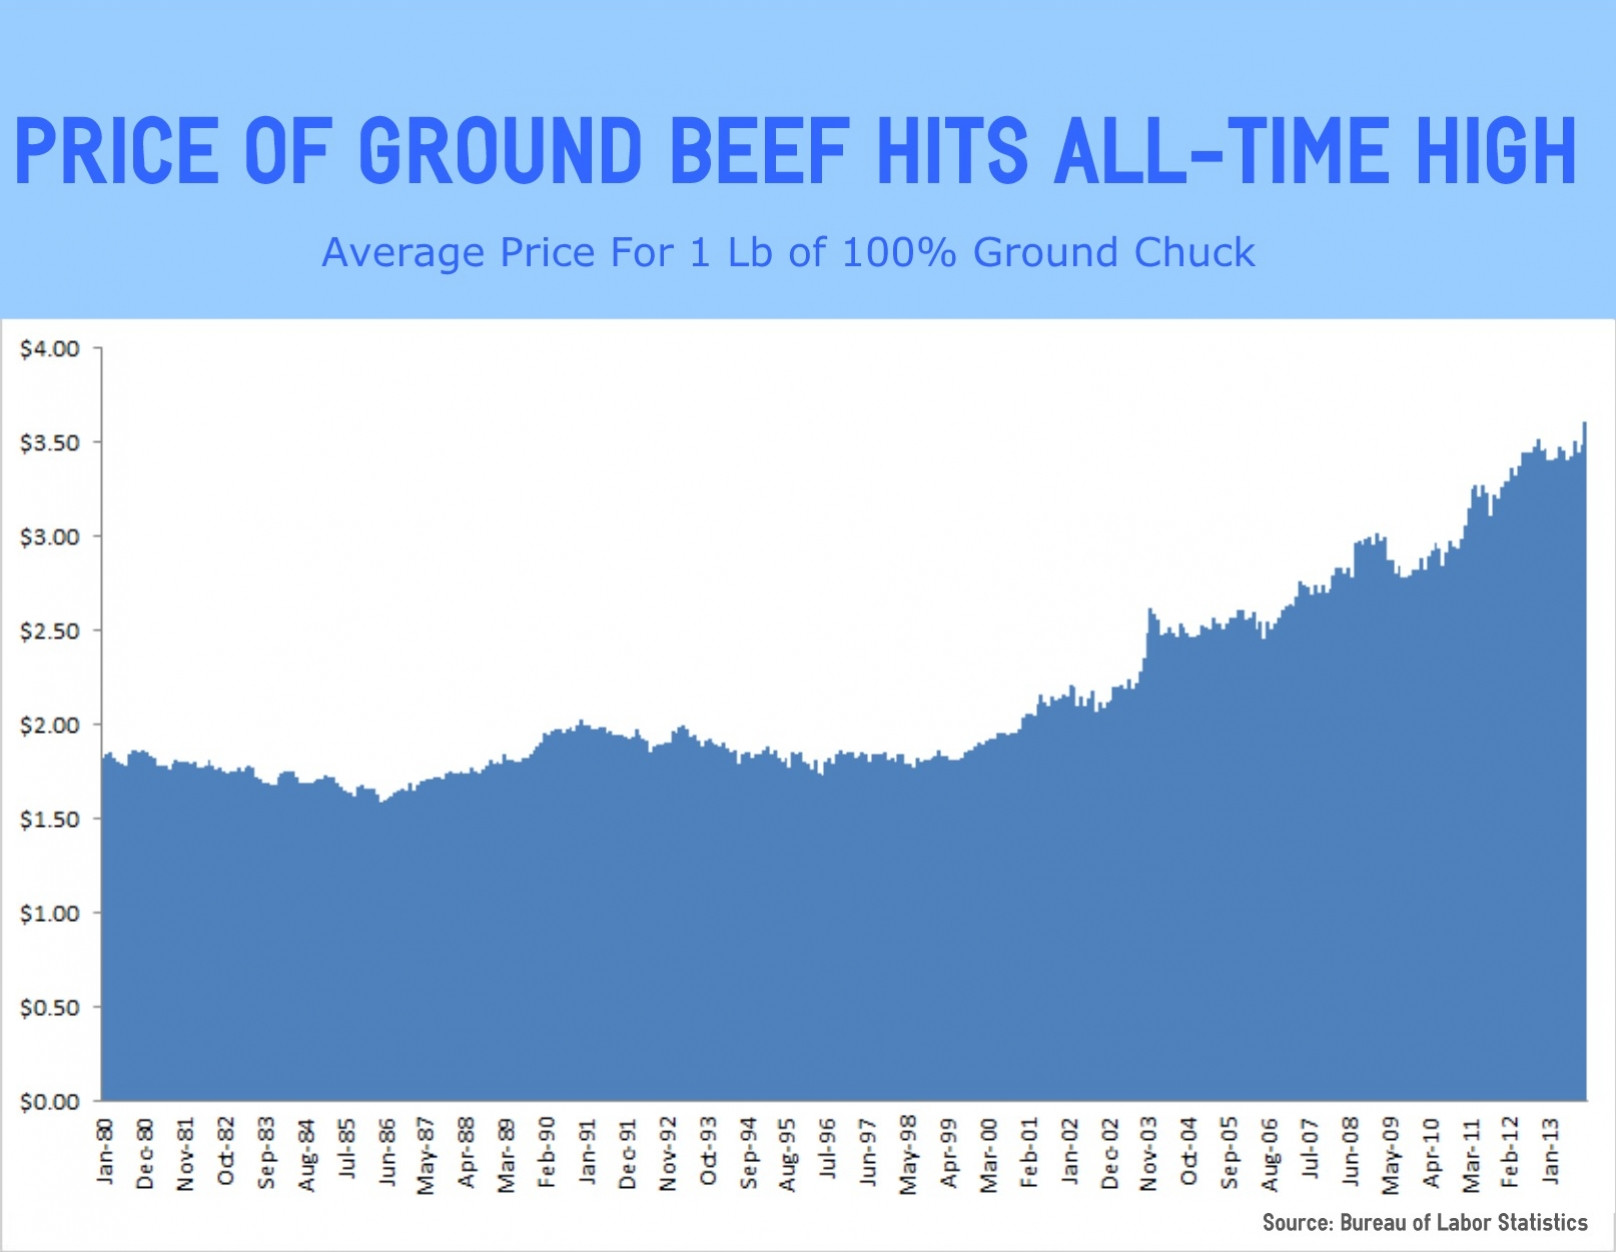 Price Of Ground Beef  Price of Ground Beef Hits All Time High